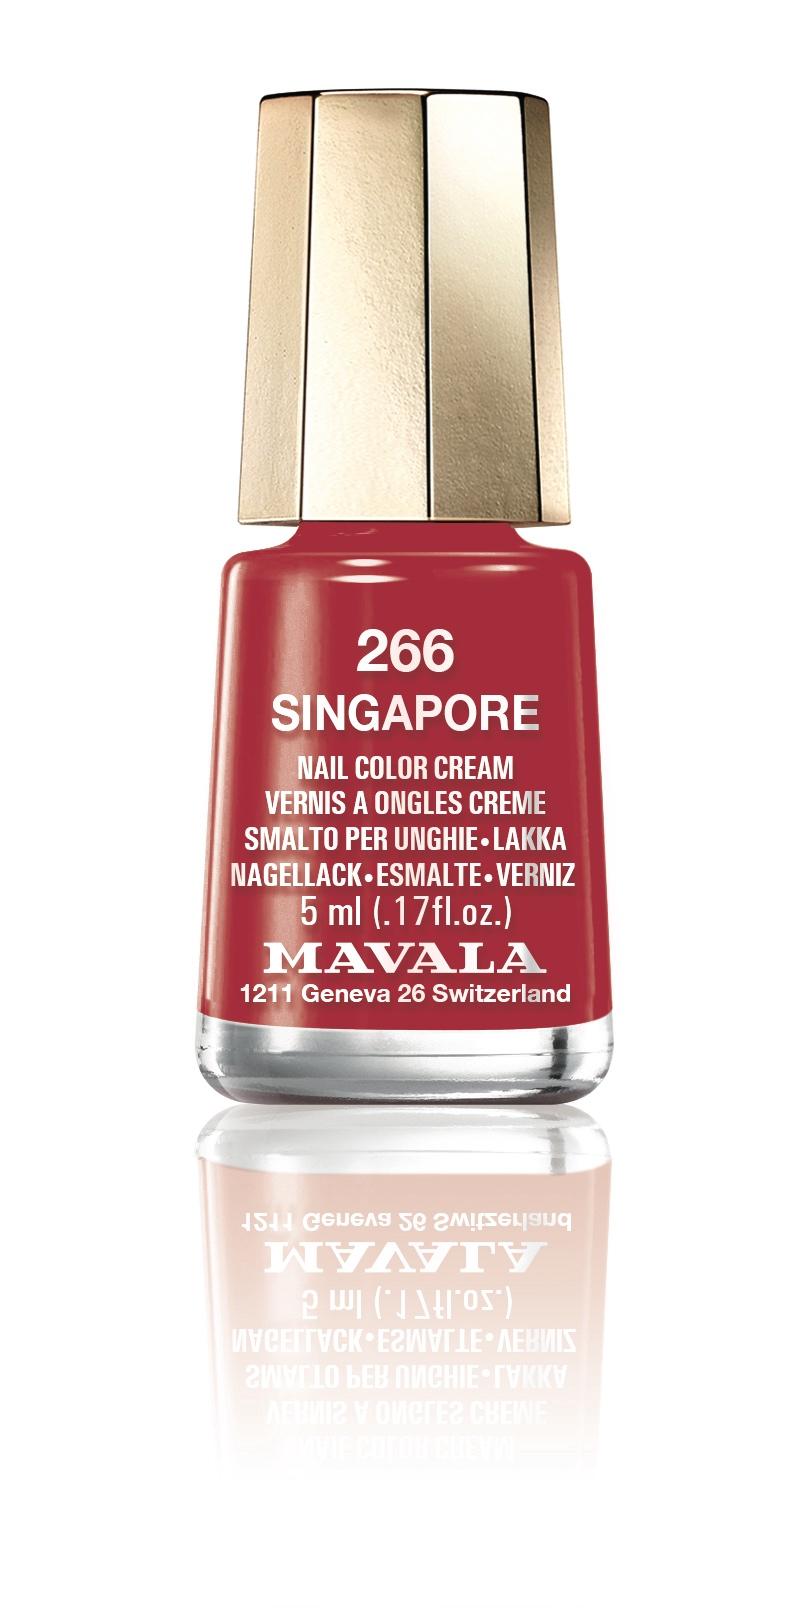 266 SINGAPORE